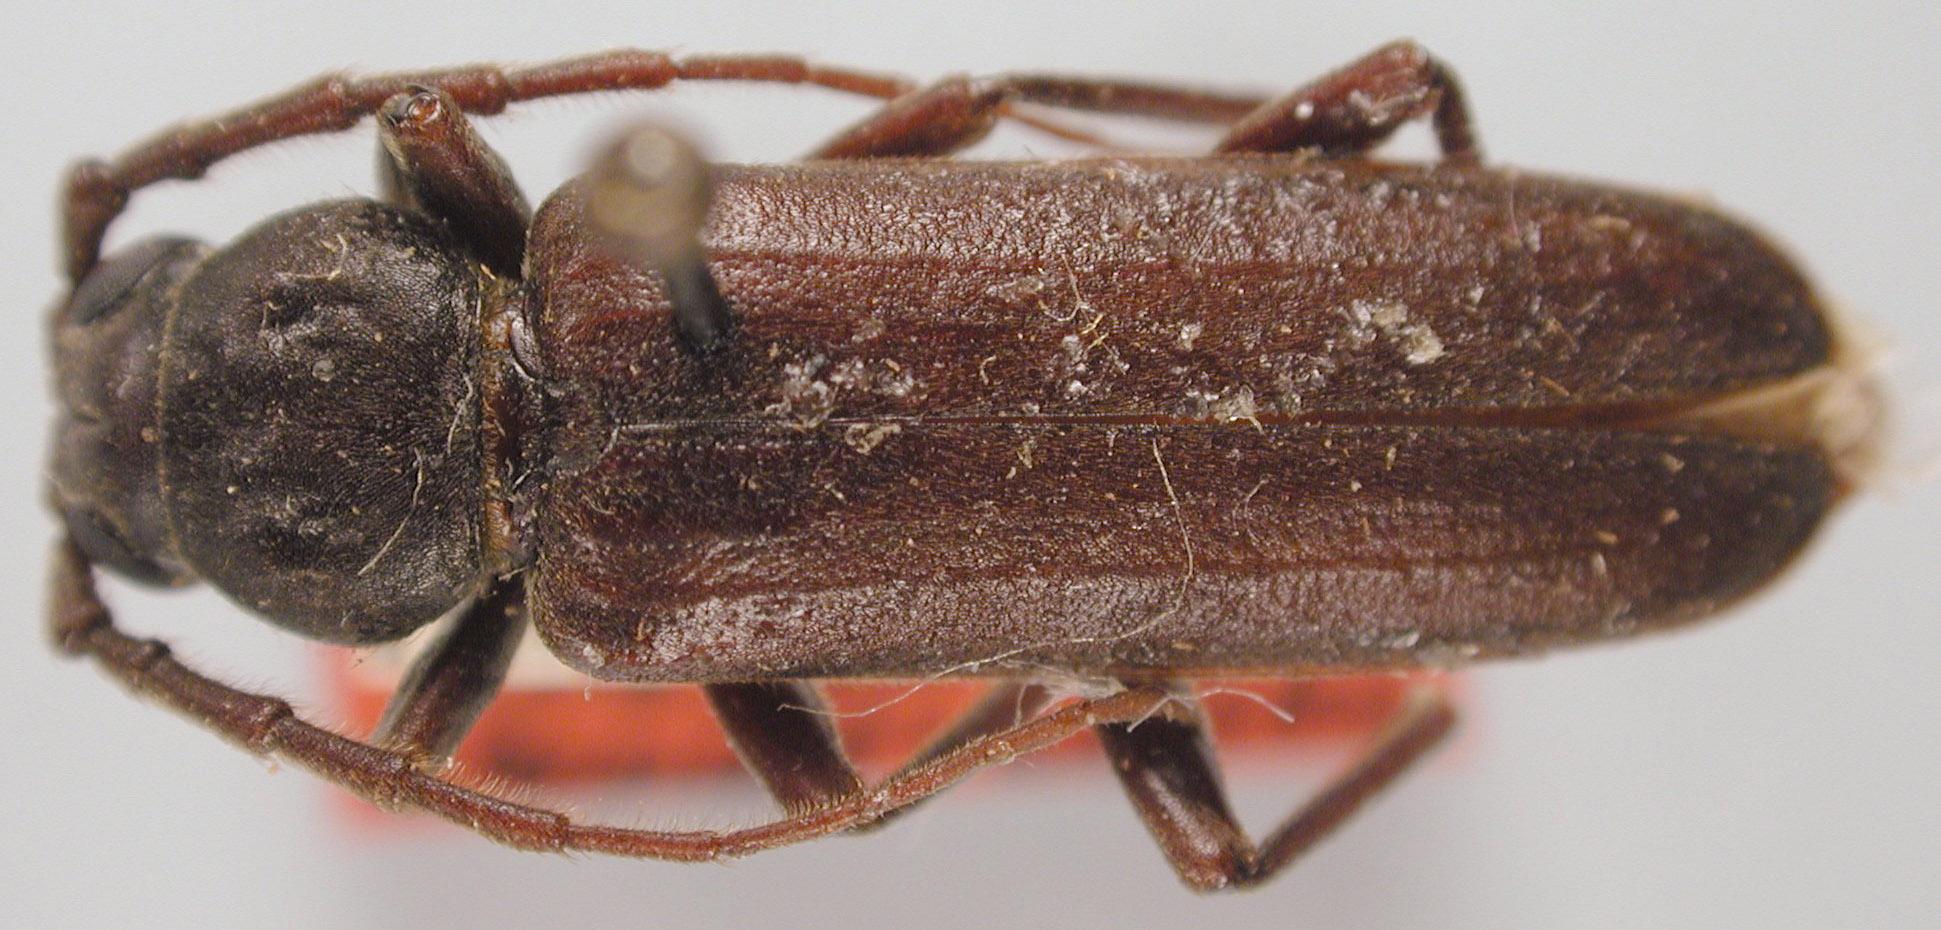 Arhopalus image